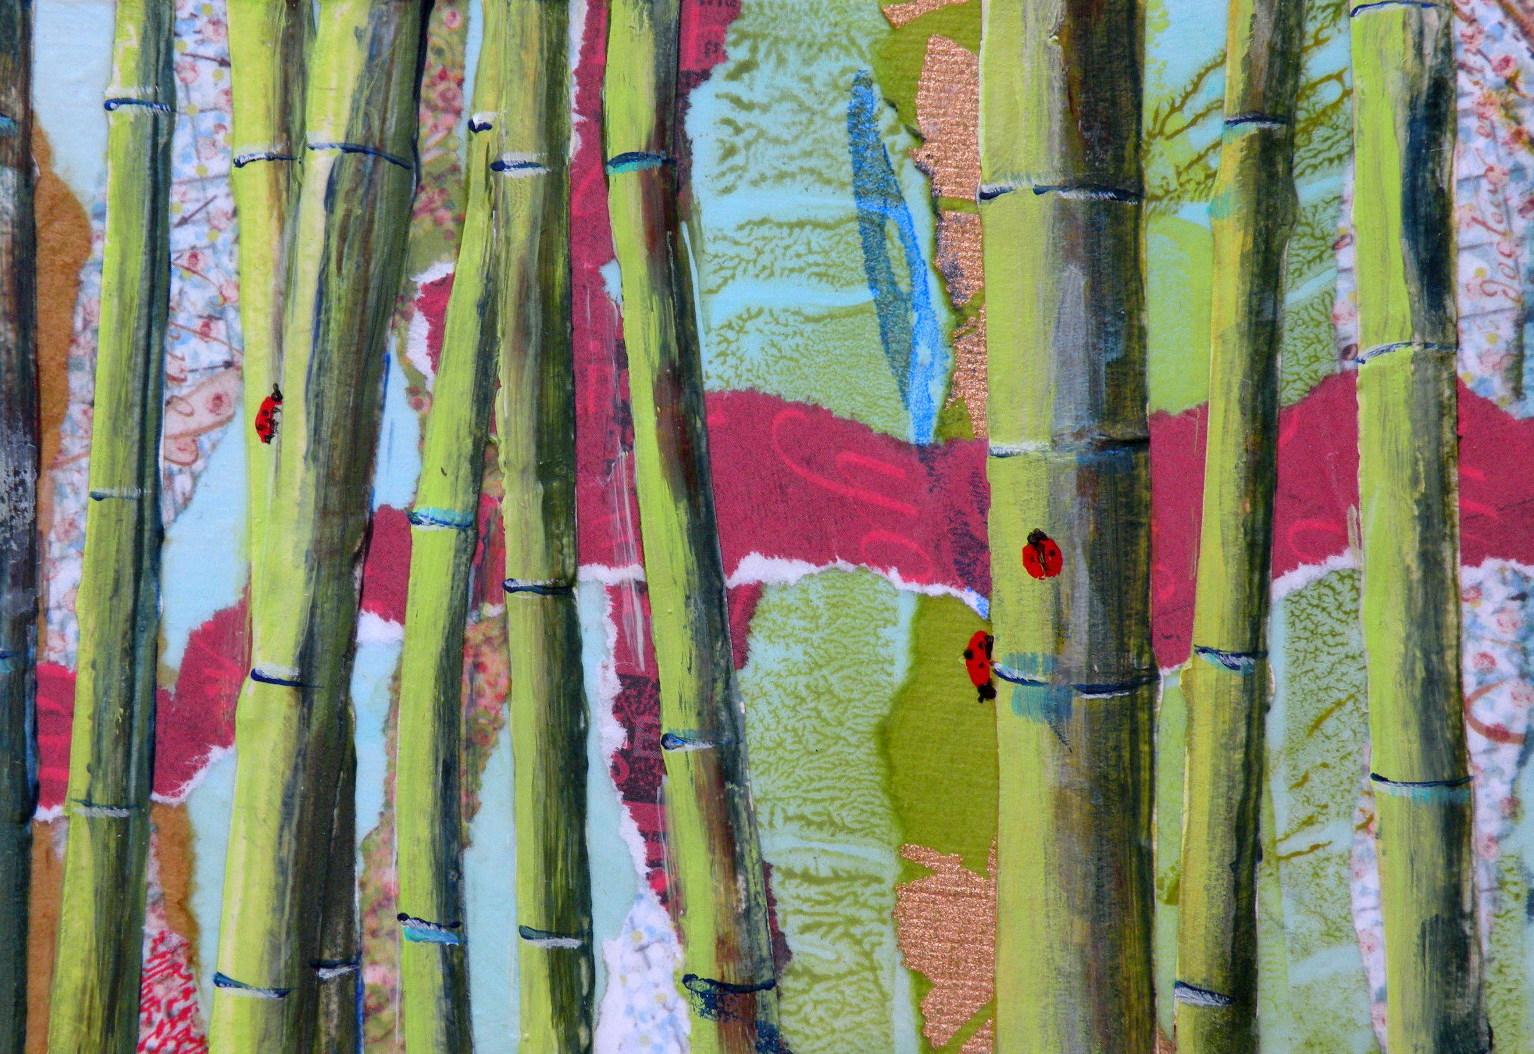 http://3.bp.blogspot.com/-kFUI9k46oA8/TV6OVFdw_8I/AAAAAAAAGHE/KKowqM3JePo/s1600/Bamboo+forest+detail+1.jpg